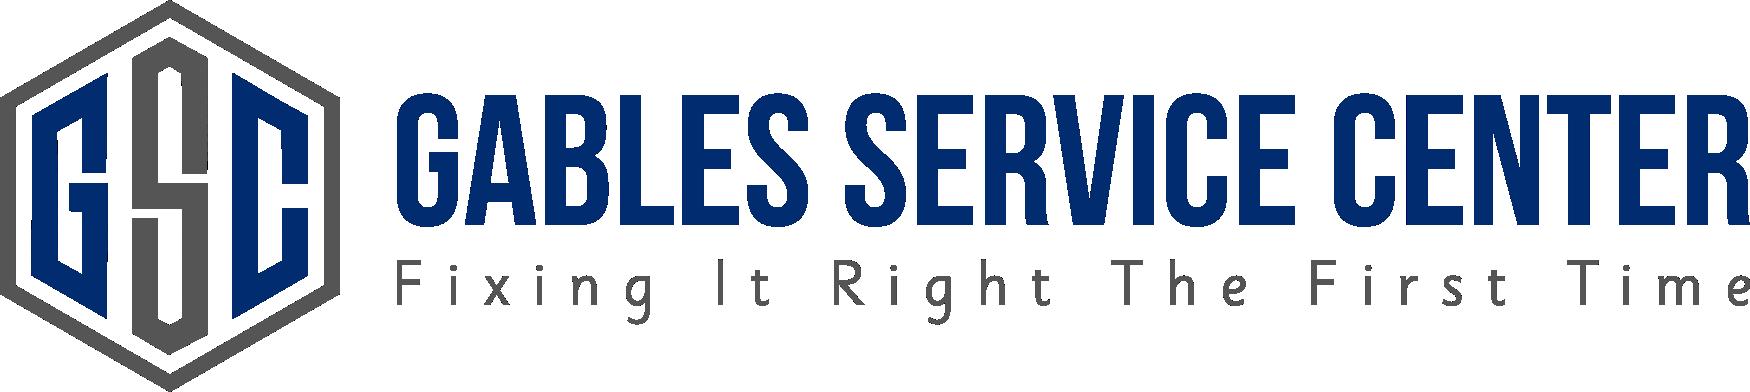 Logo_HD_PNG_Transparent_File